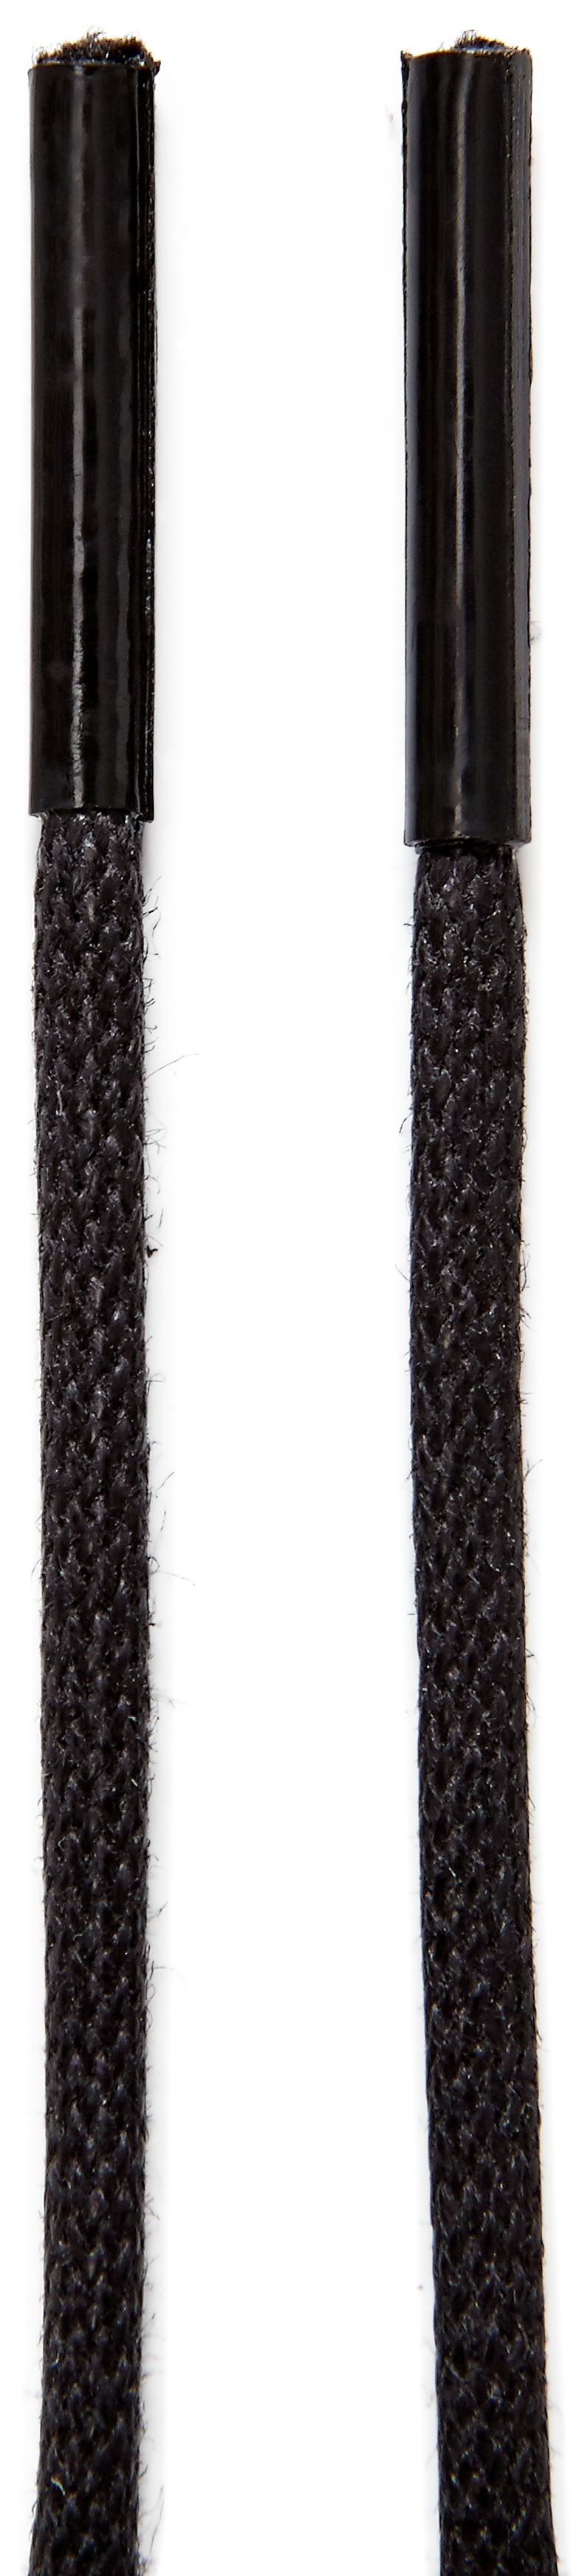 Round Laces (Black)